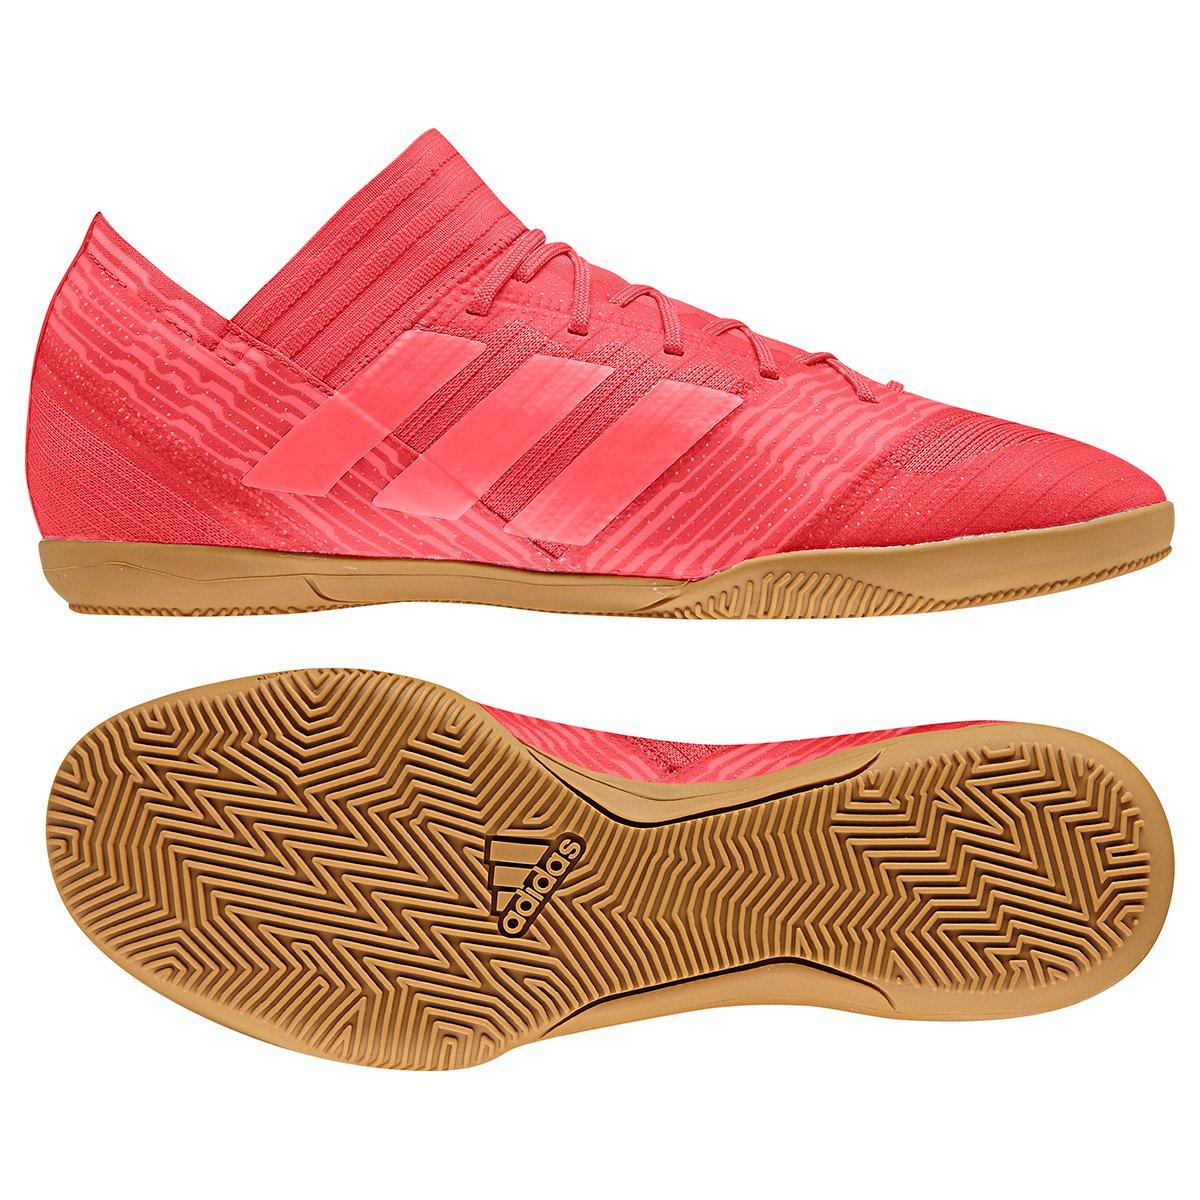 3443137d52d50 Chuteira Futsal Adidas Nemeziz 17.3 IN - Vermelho - Compre Agora ...